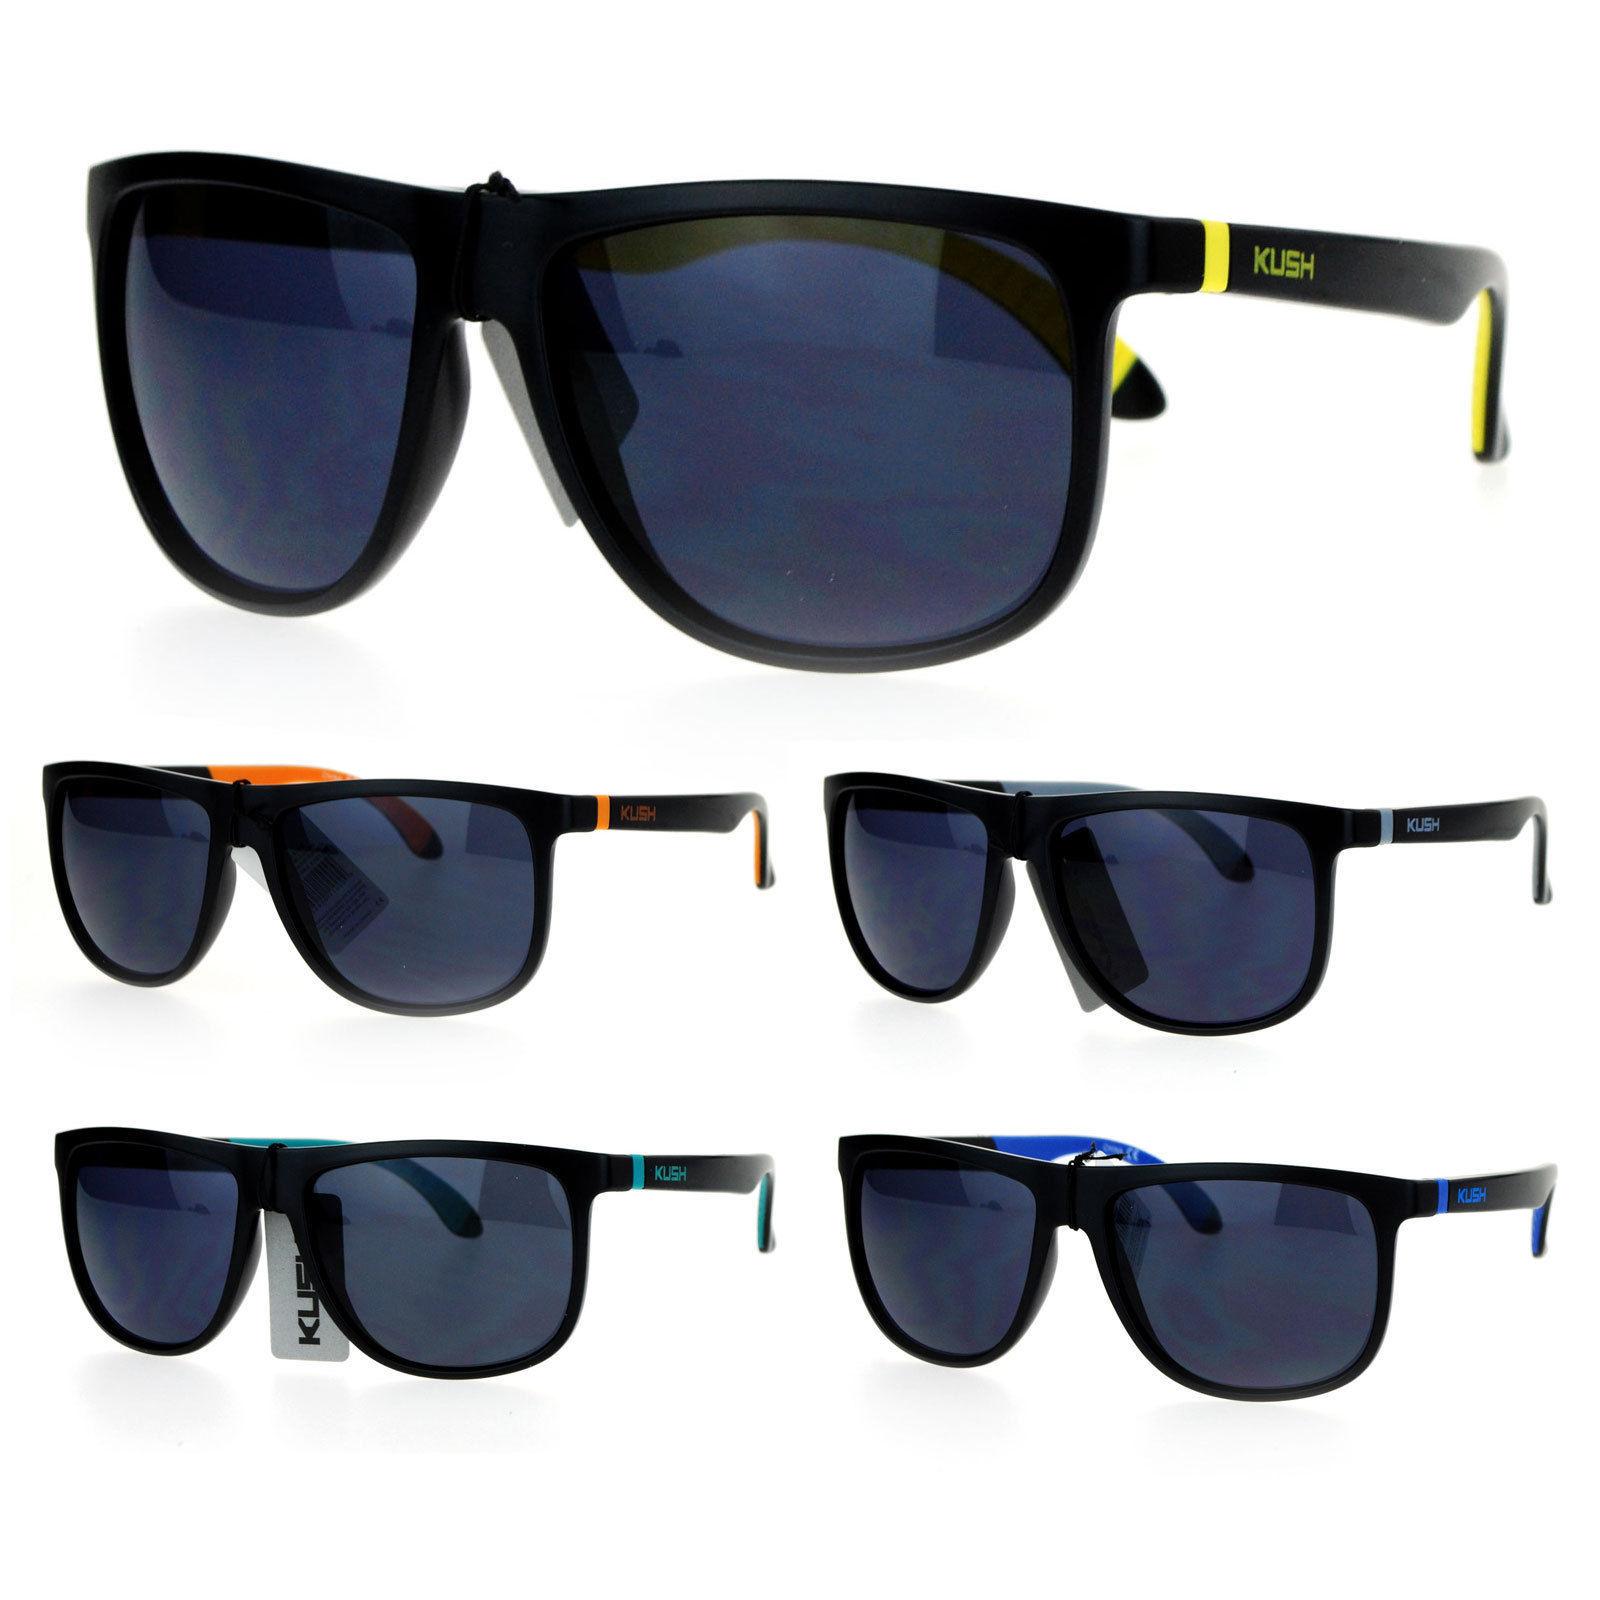 da7c28c5d8 S l1600. S l1600. Kush Matte Soft Rubber Arm Thin Plastic Horn Rim Mens  Sunglasses · Kush Matte ...